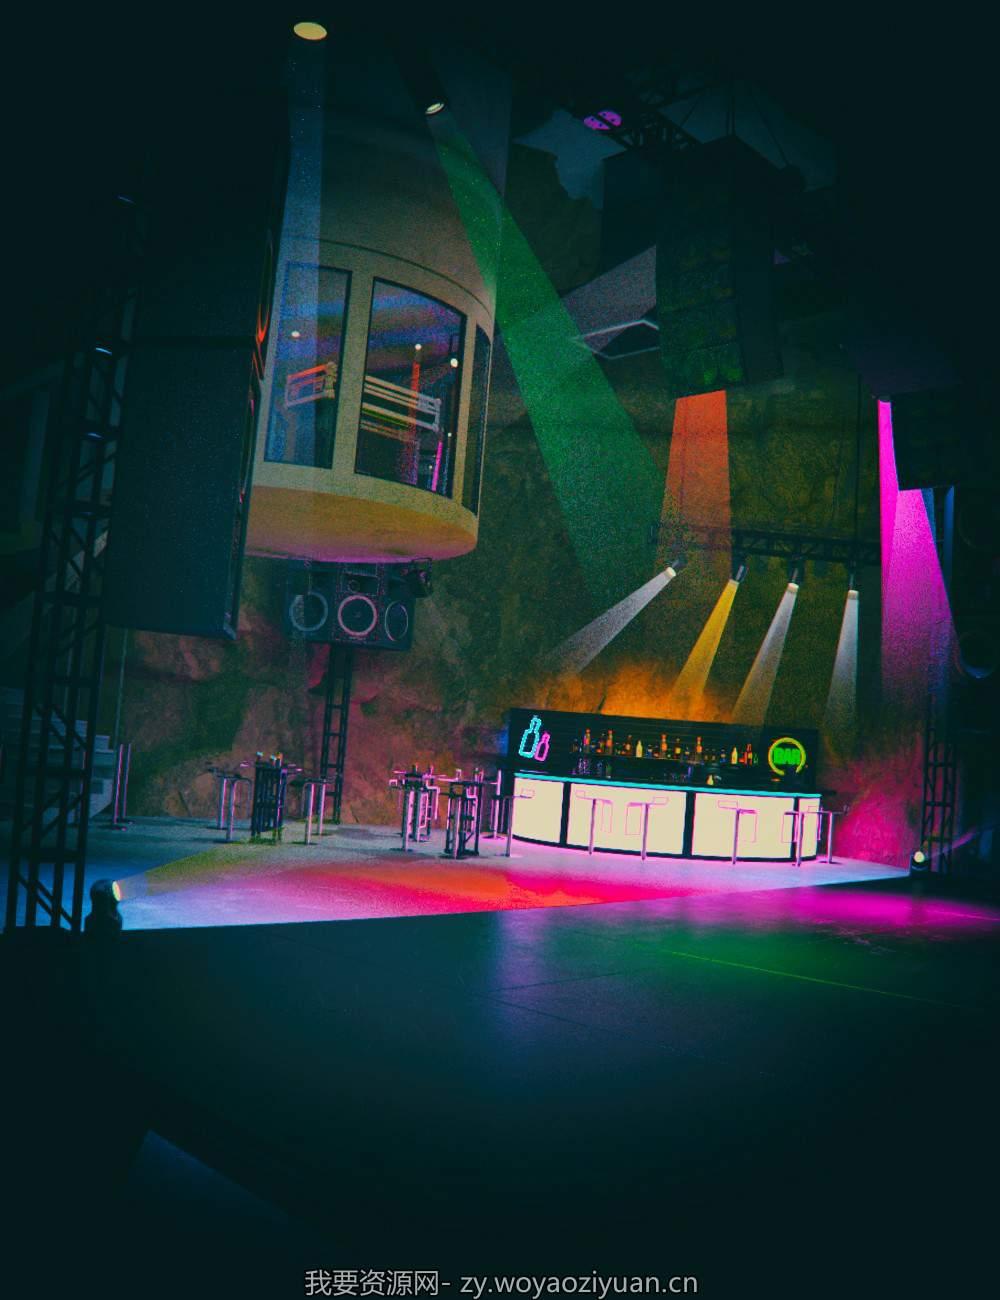 Underground Dance Club and Bar